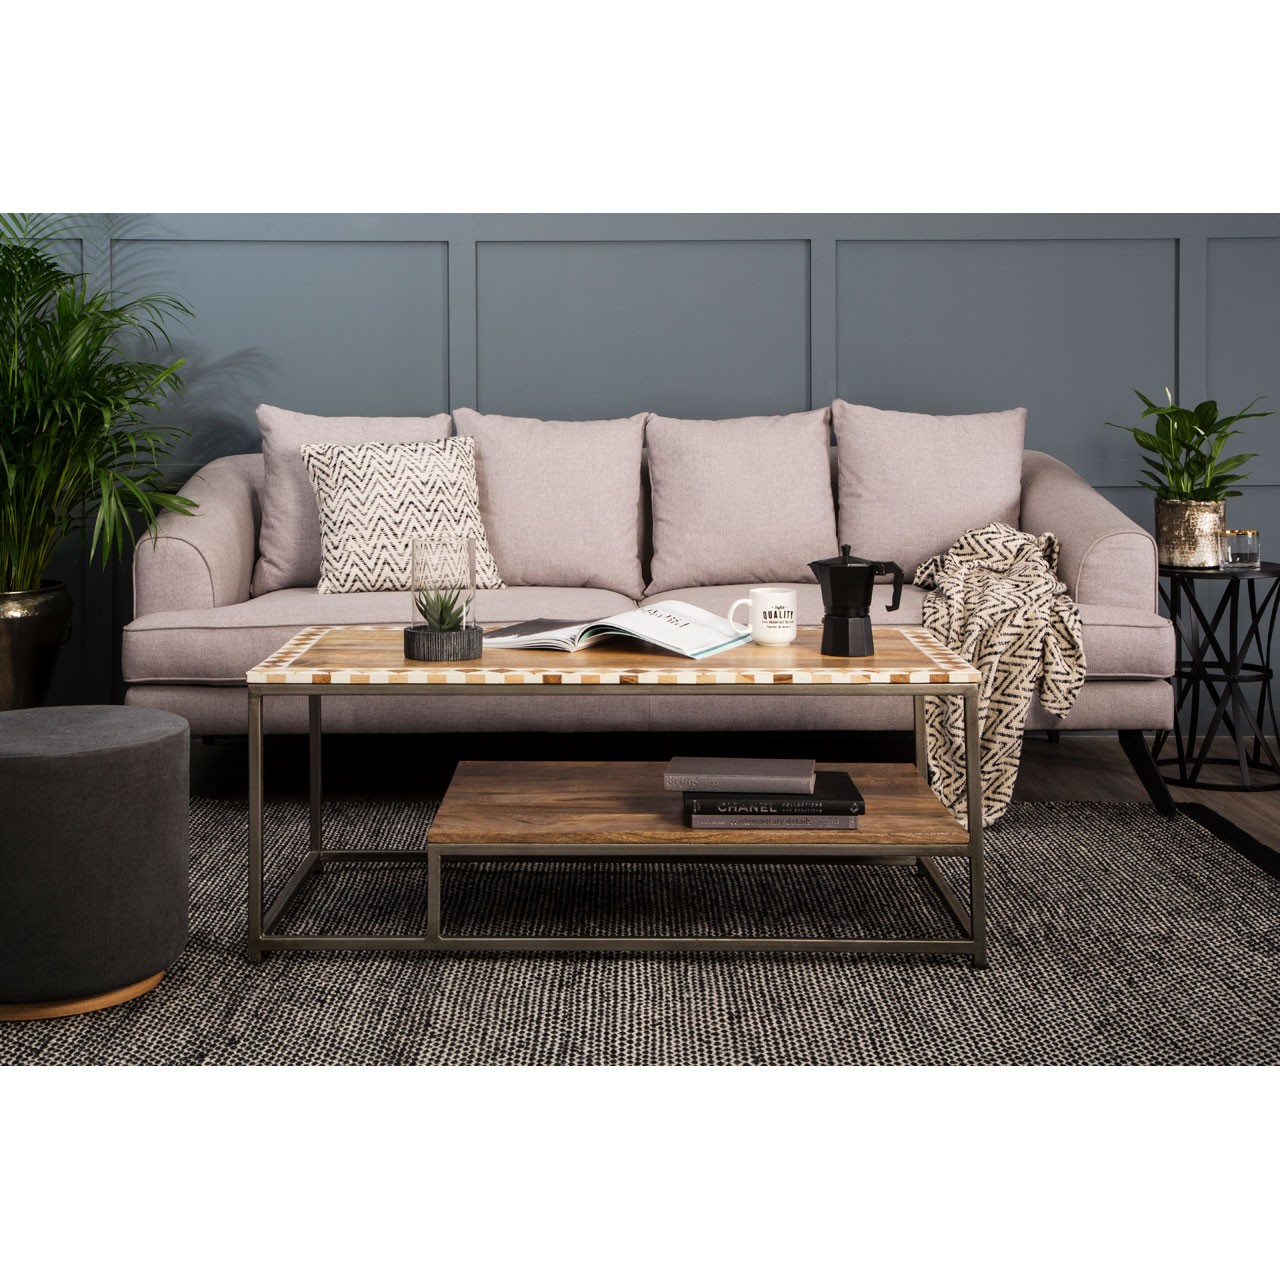 Mylo 3 Seater Natural Fabric Sofa